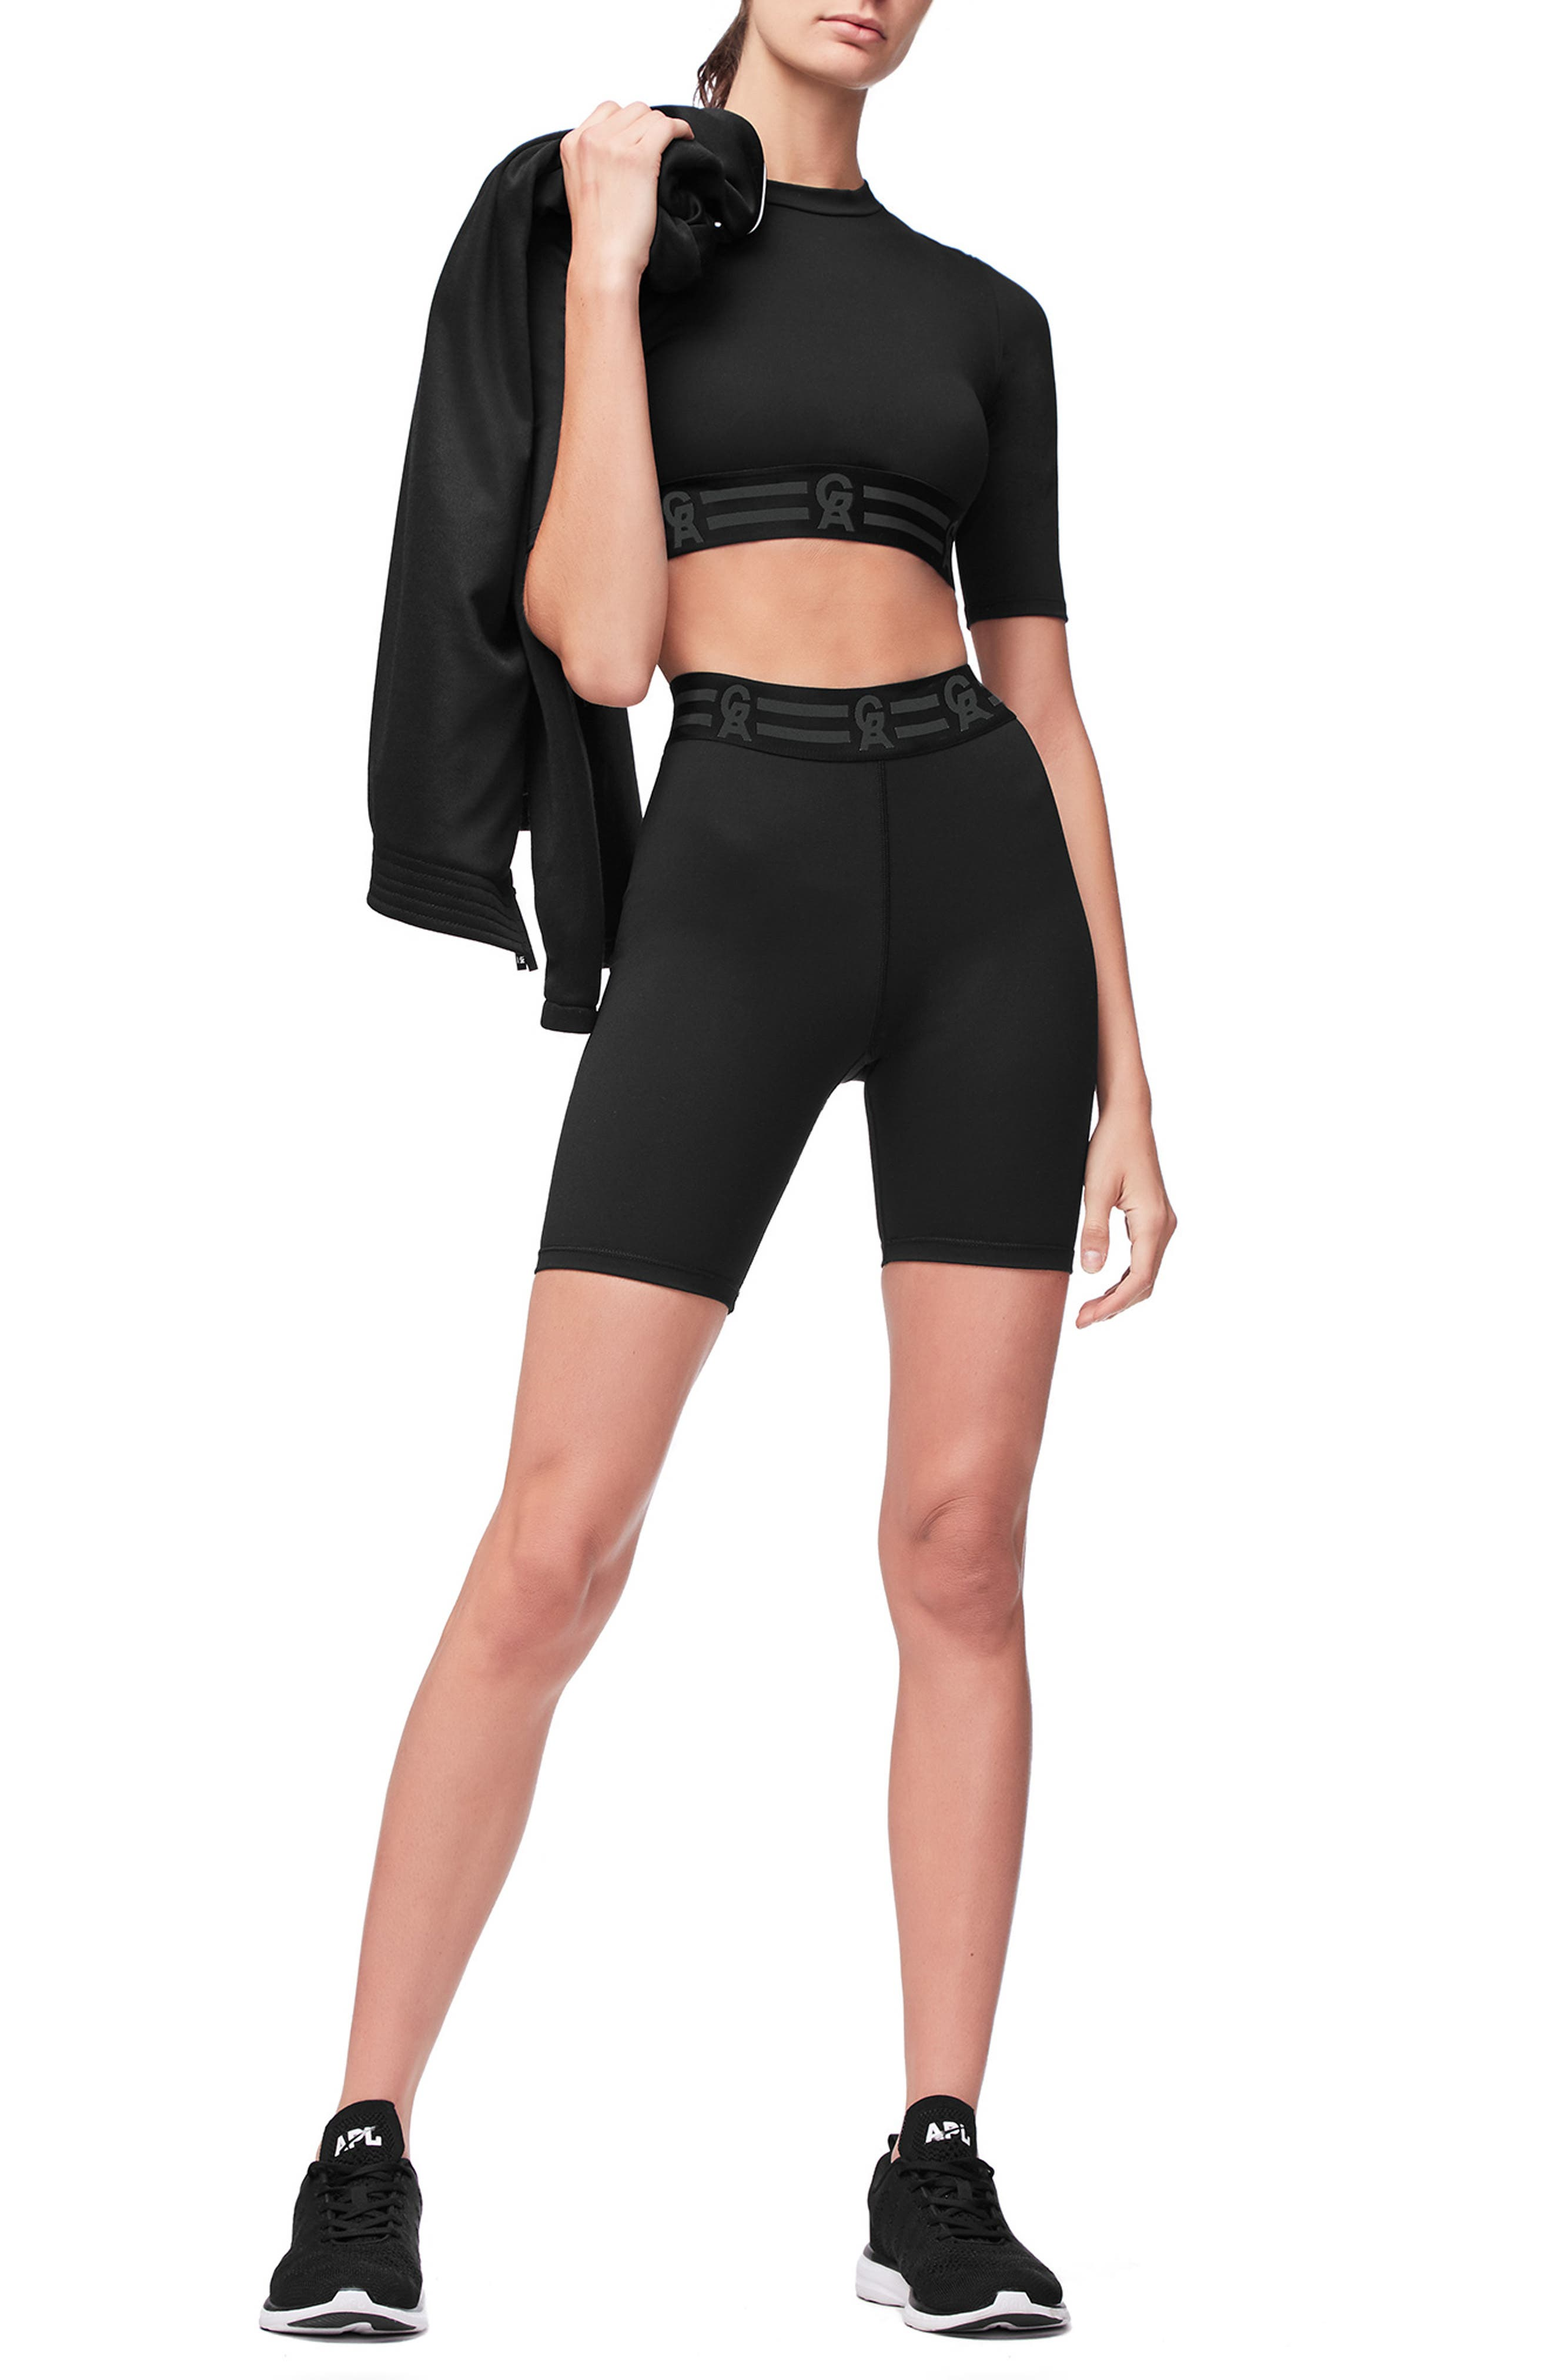 Icon High Waist Biker Shorts,                             Alternate thumbnail 8, color,                             BLACK001